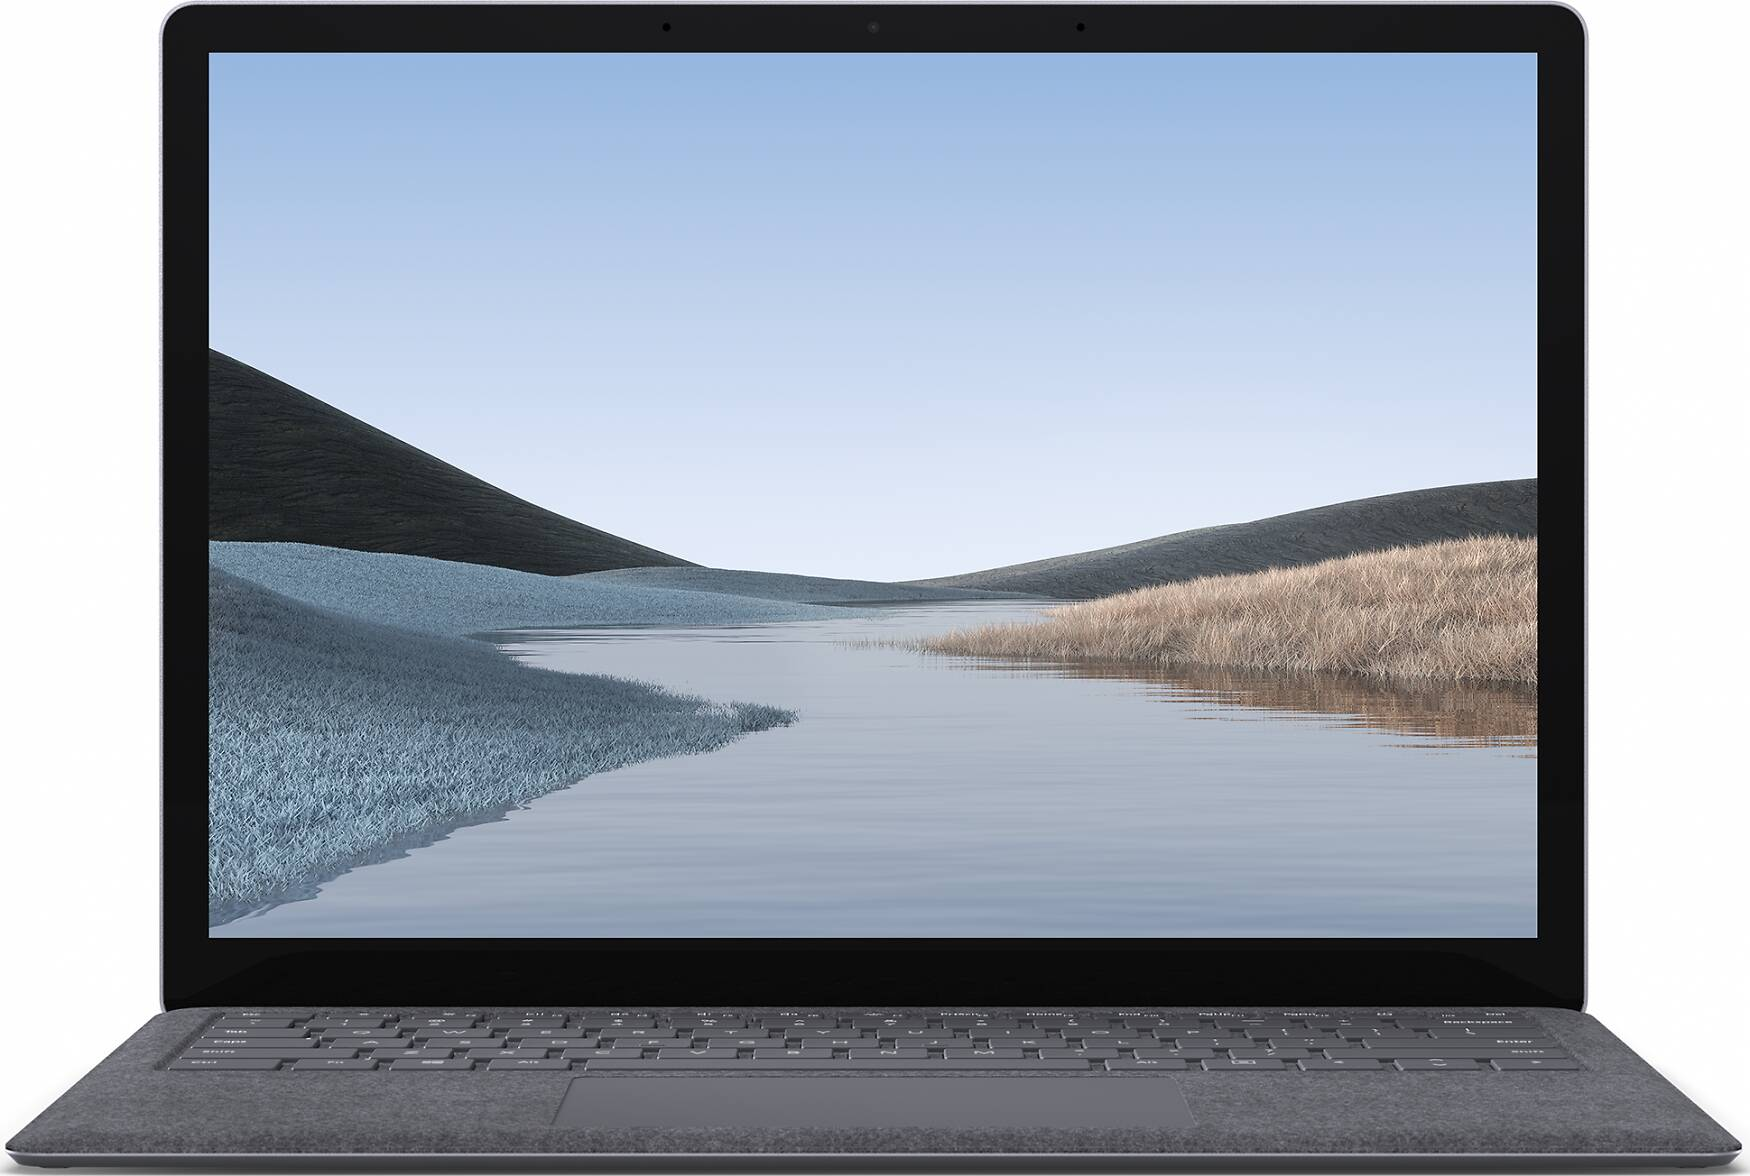 Microsoft Surface Laptop 3 13,5 Zoll, Core i5, 8GB RAM, 128GB SSD, Platin